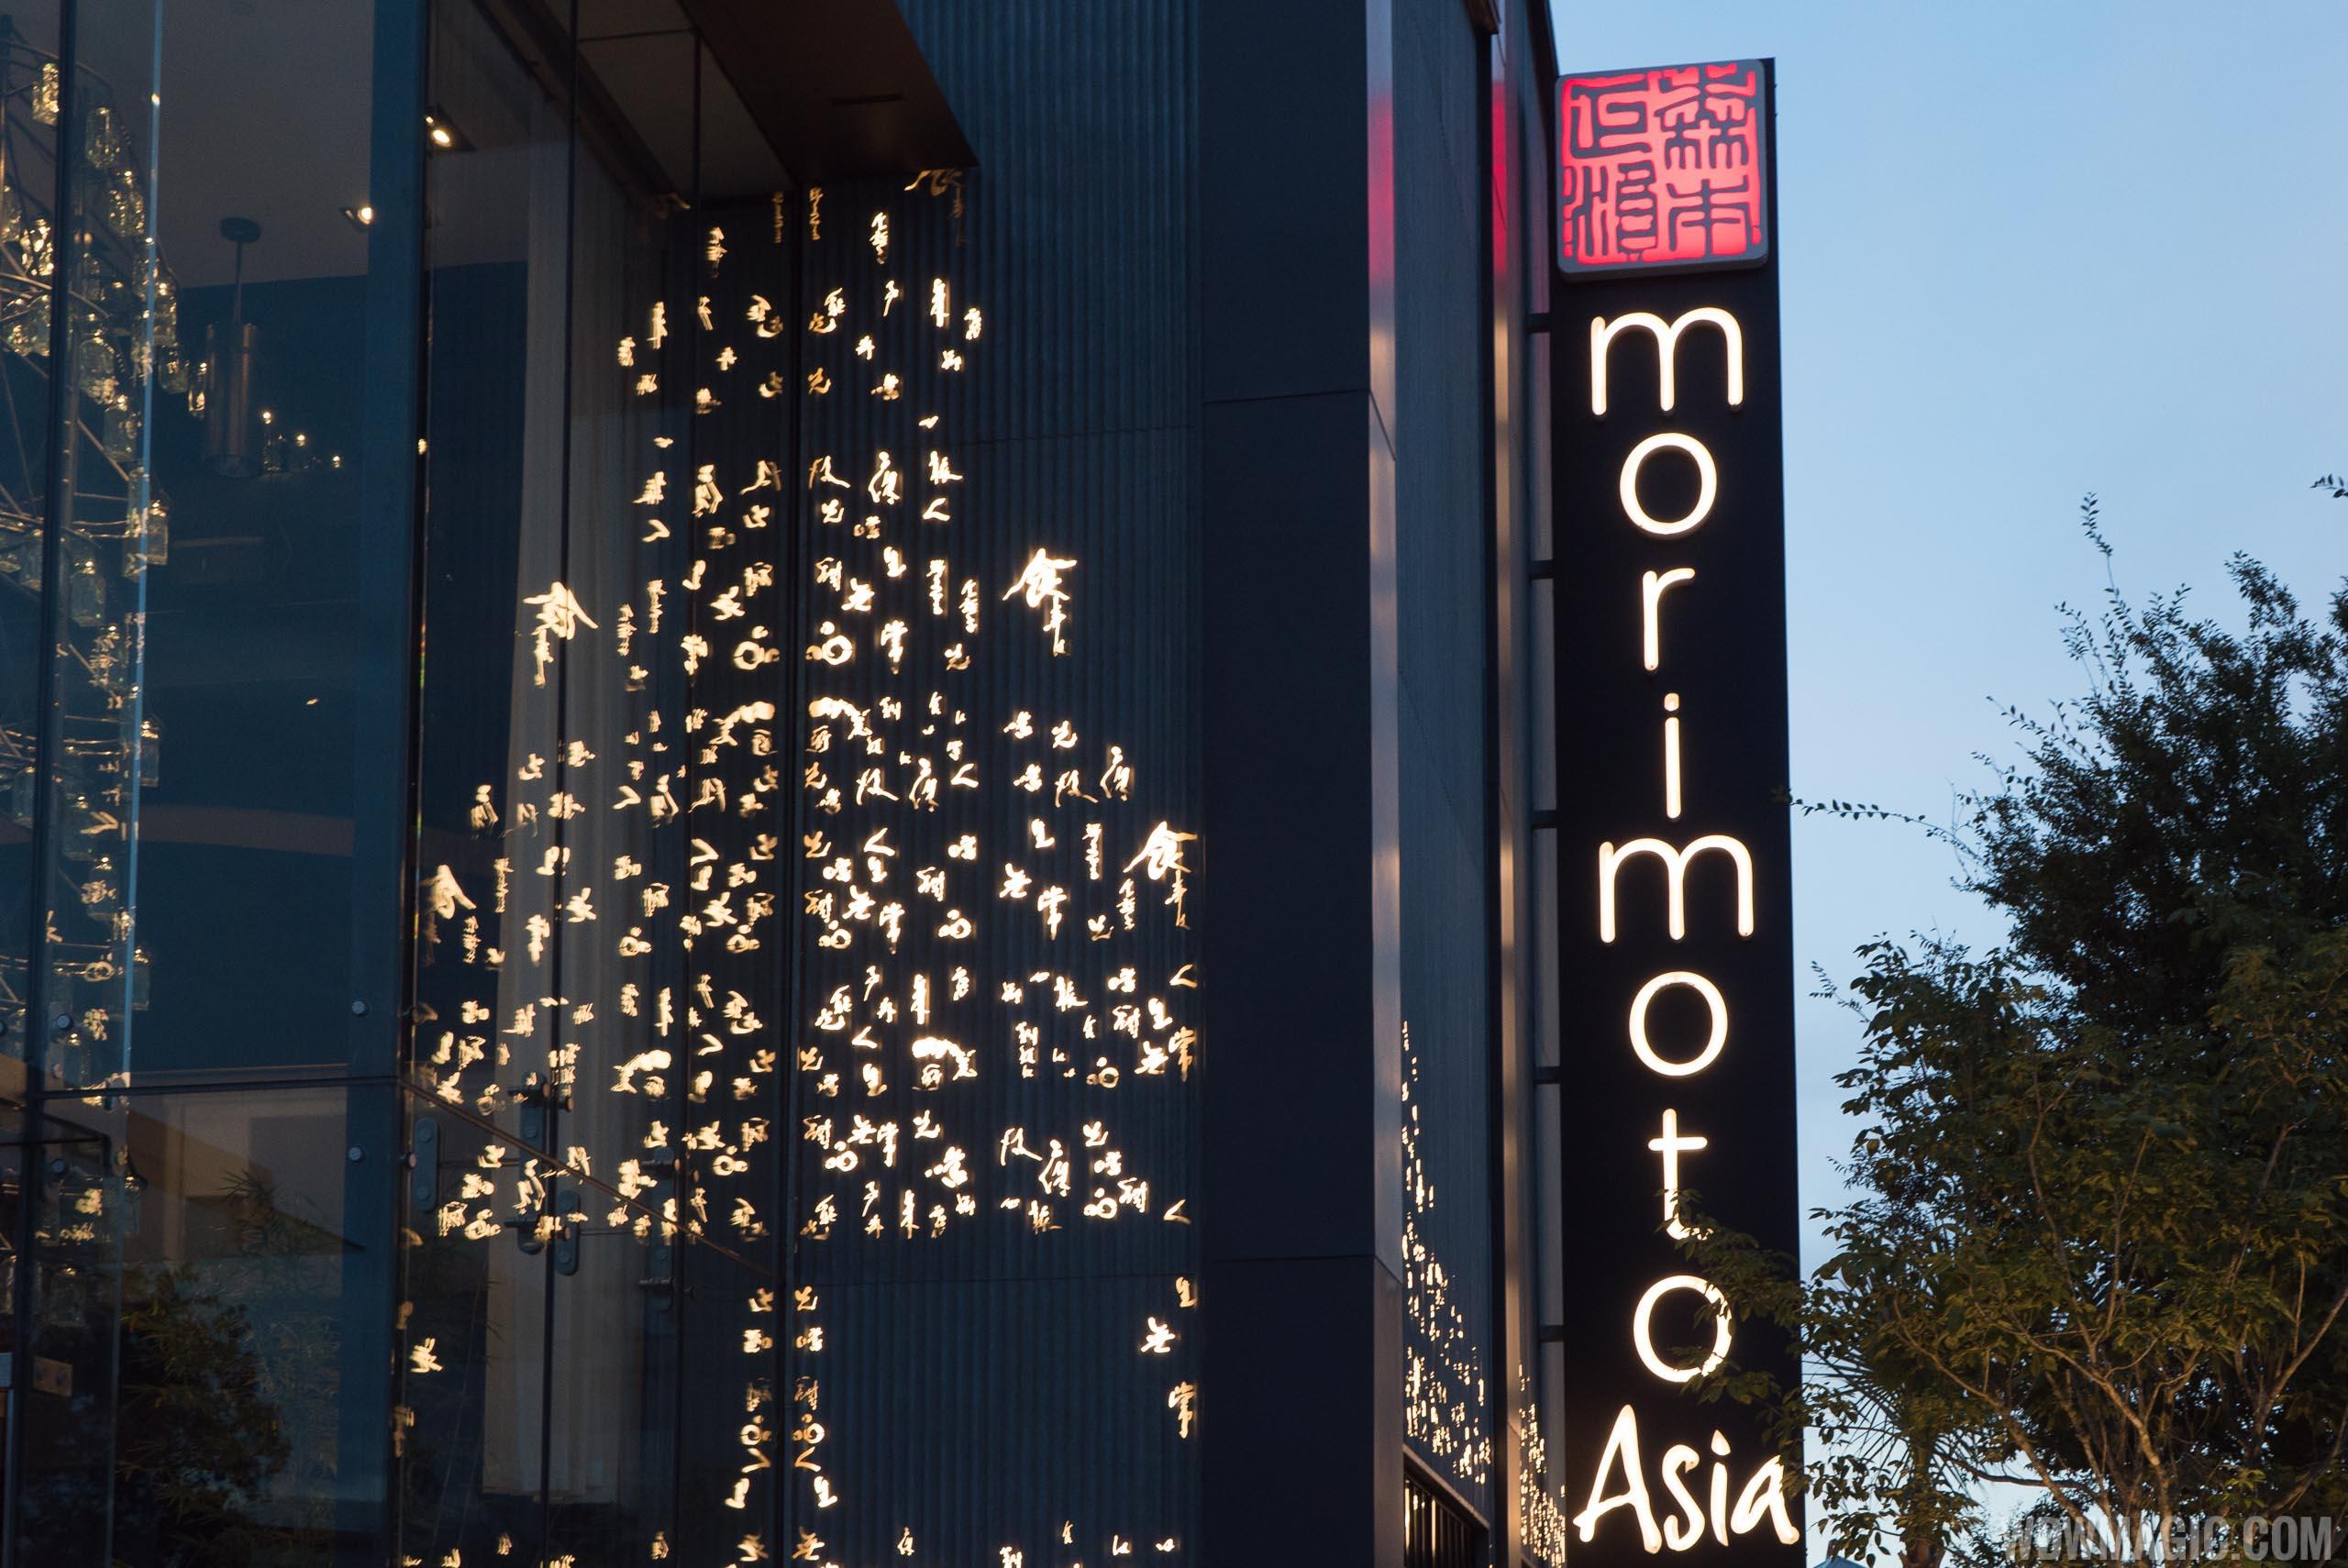 Morimoto Asia overview